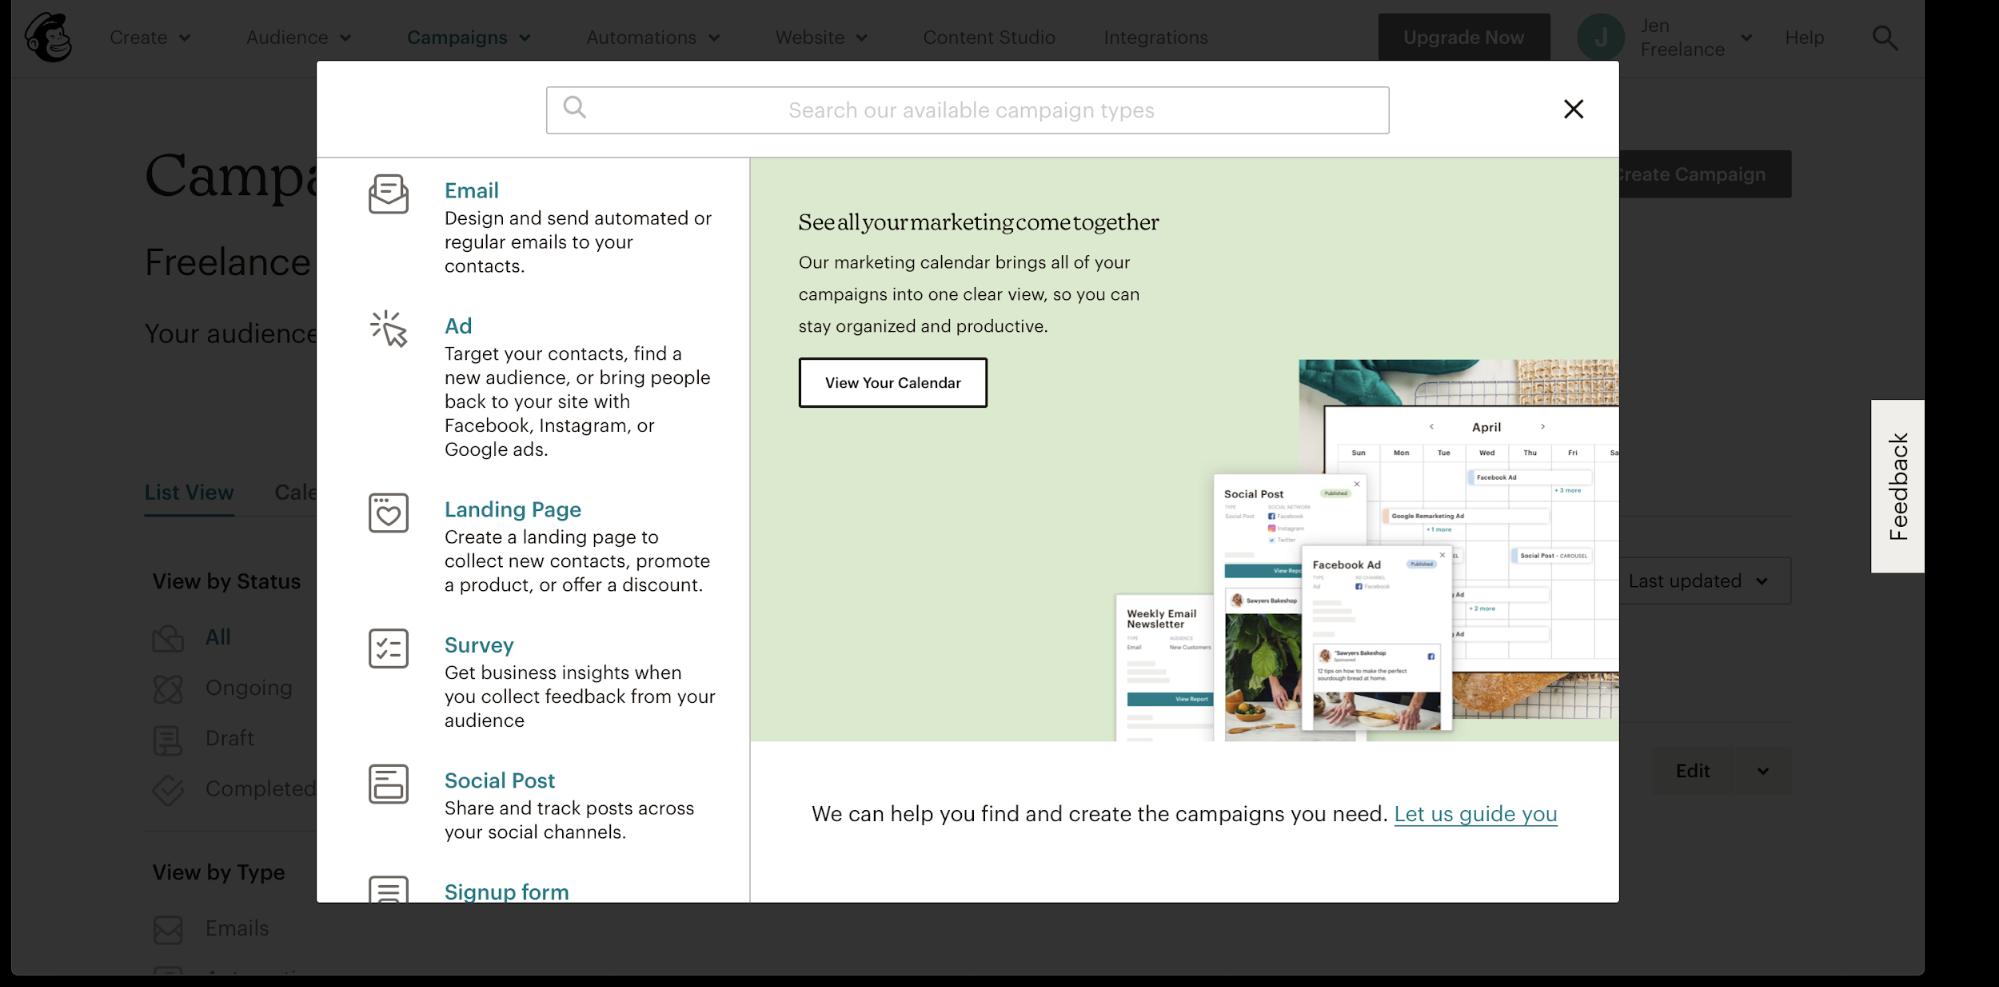 Mailchimp's intuitive interface